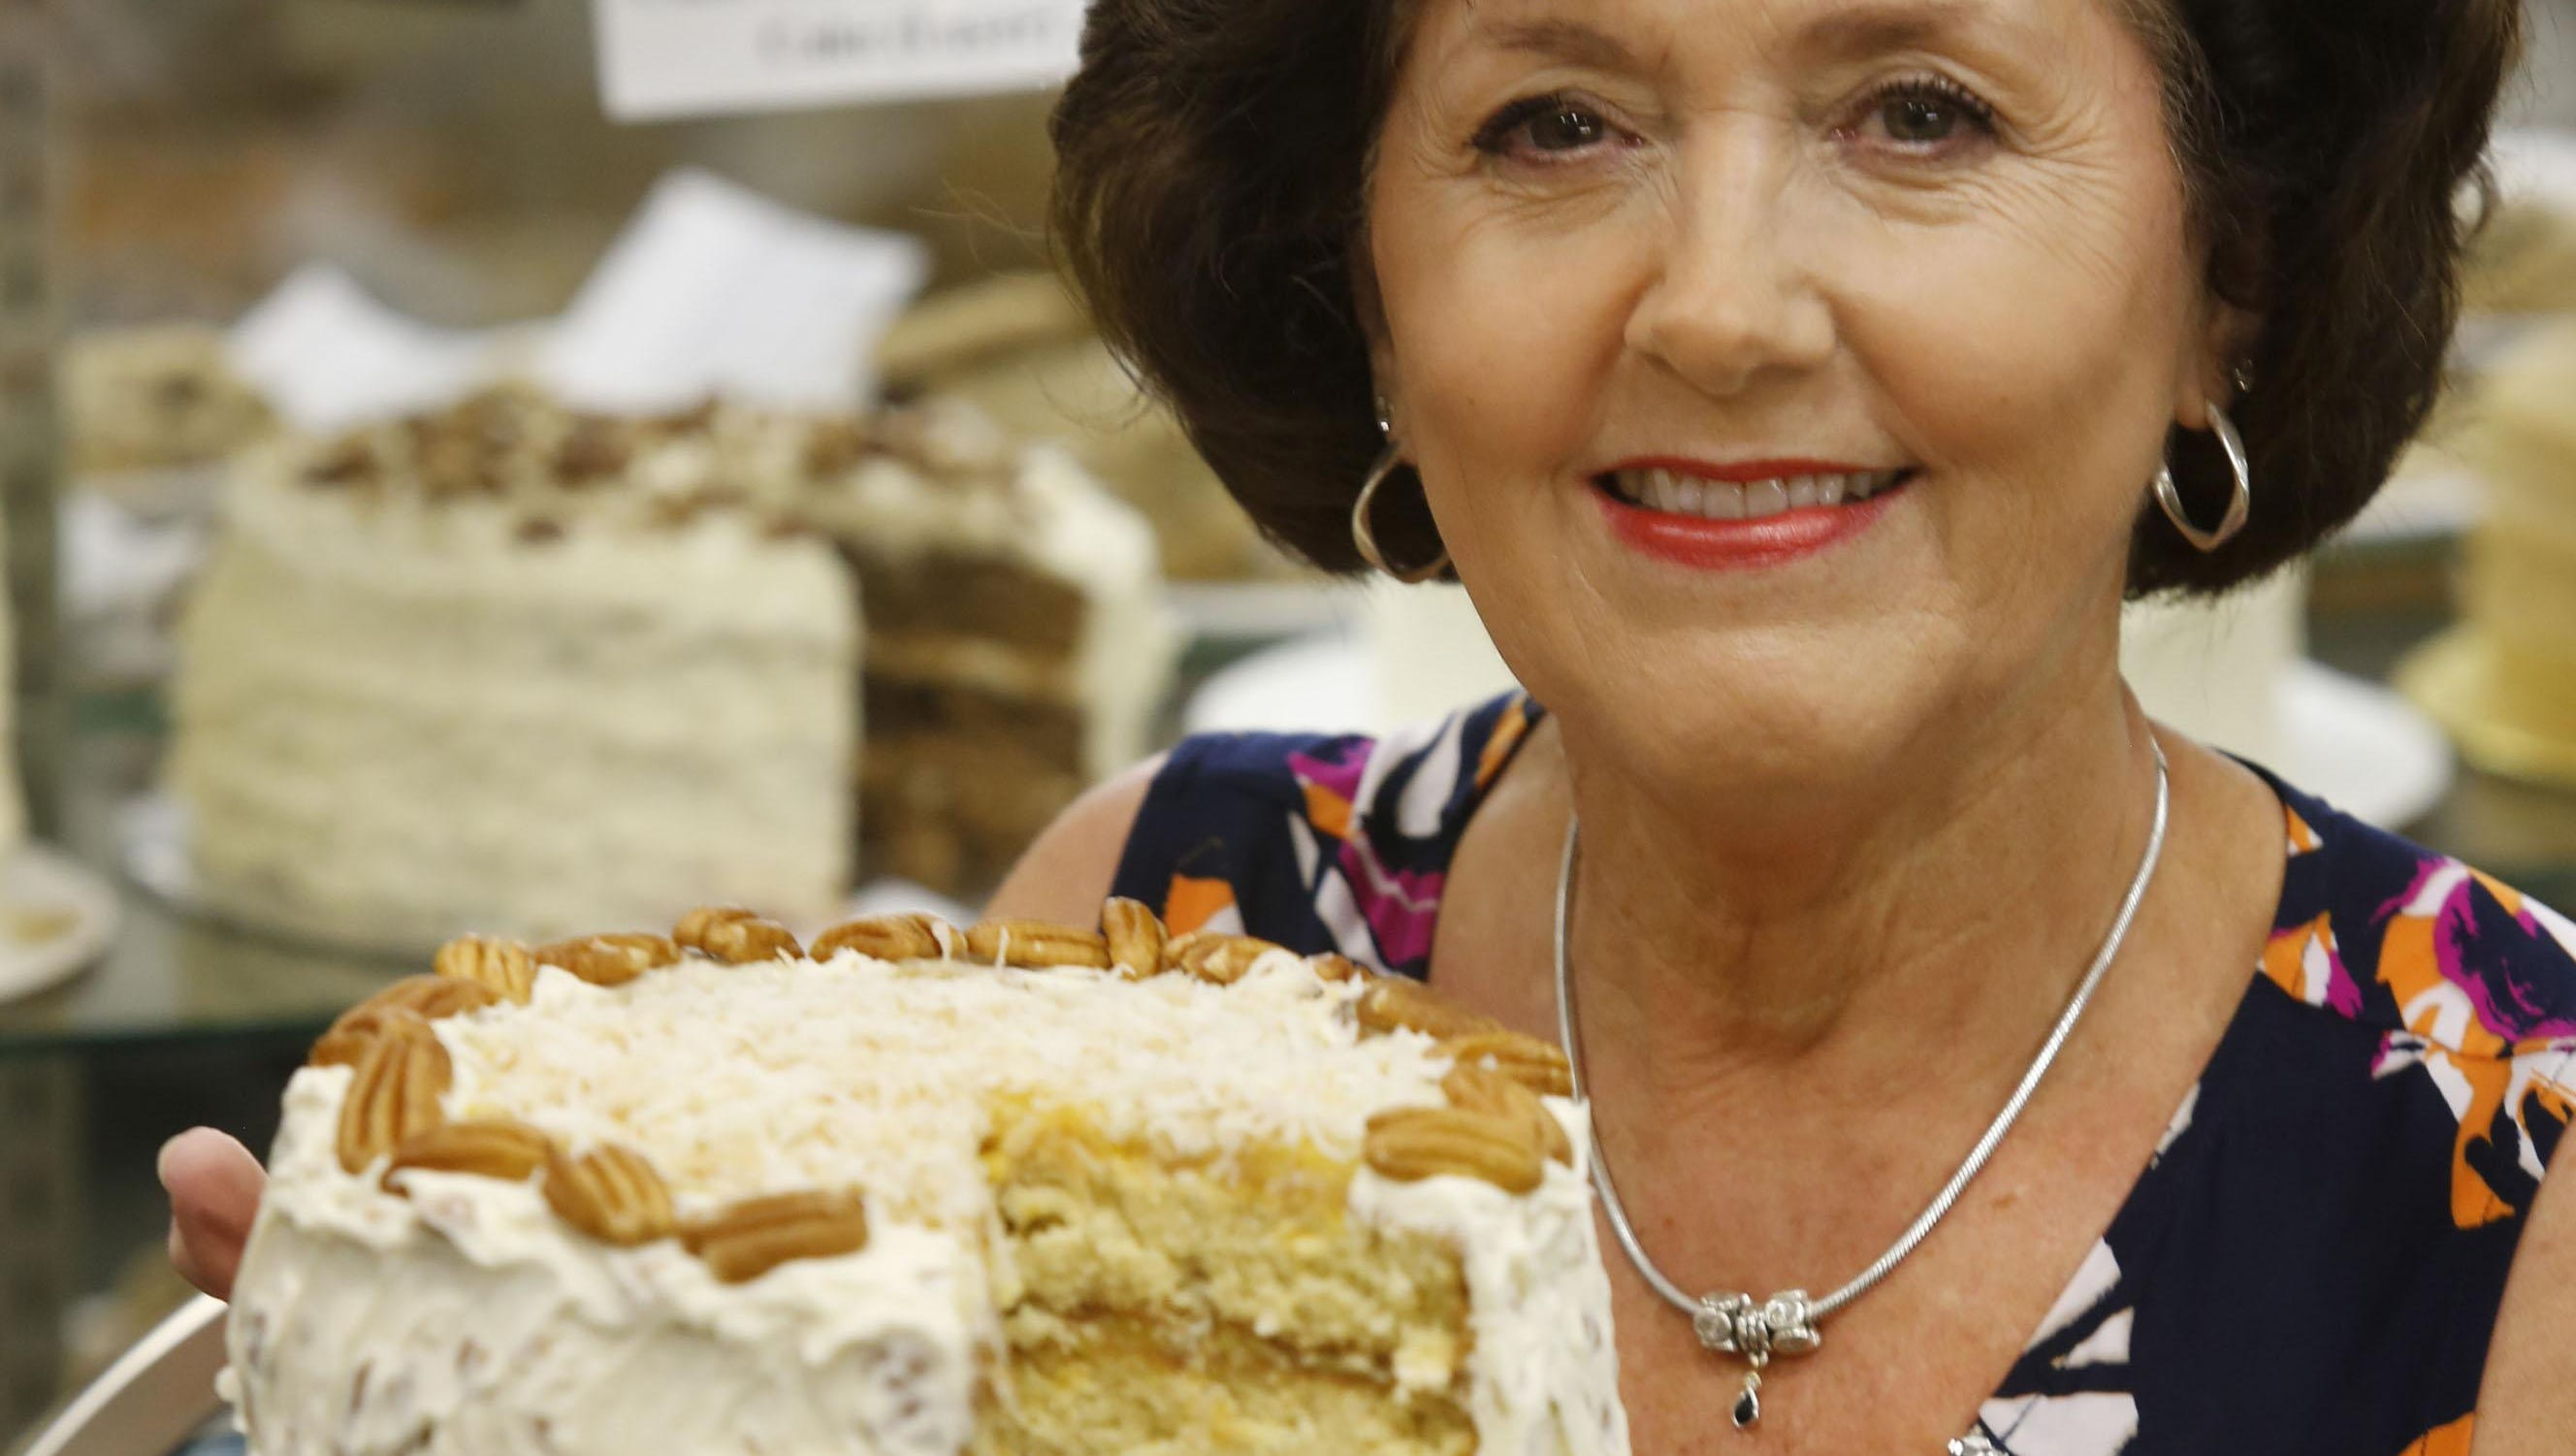 Fair Veteran Rookie Nab Blue Ribbons For Cakes